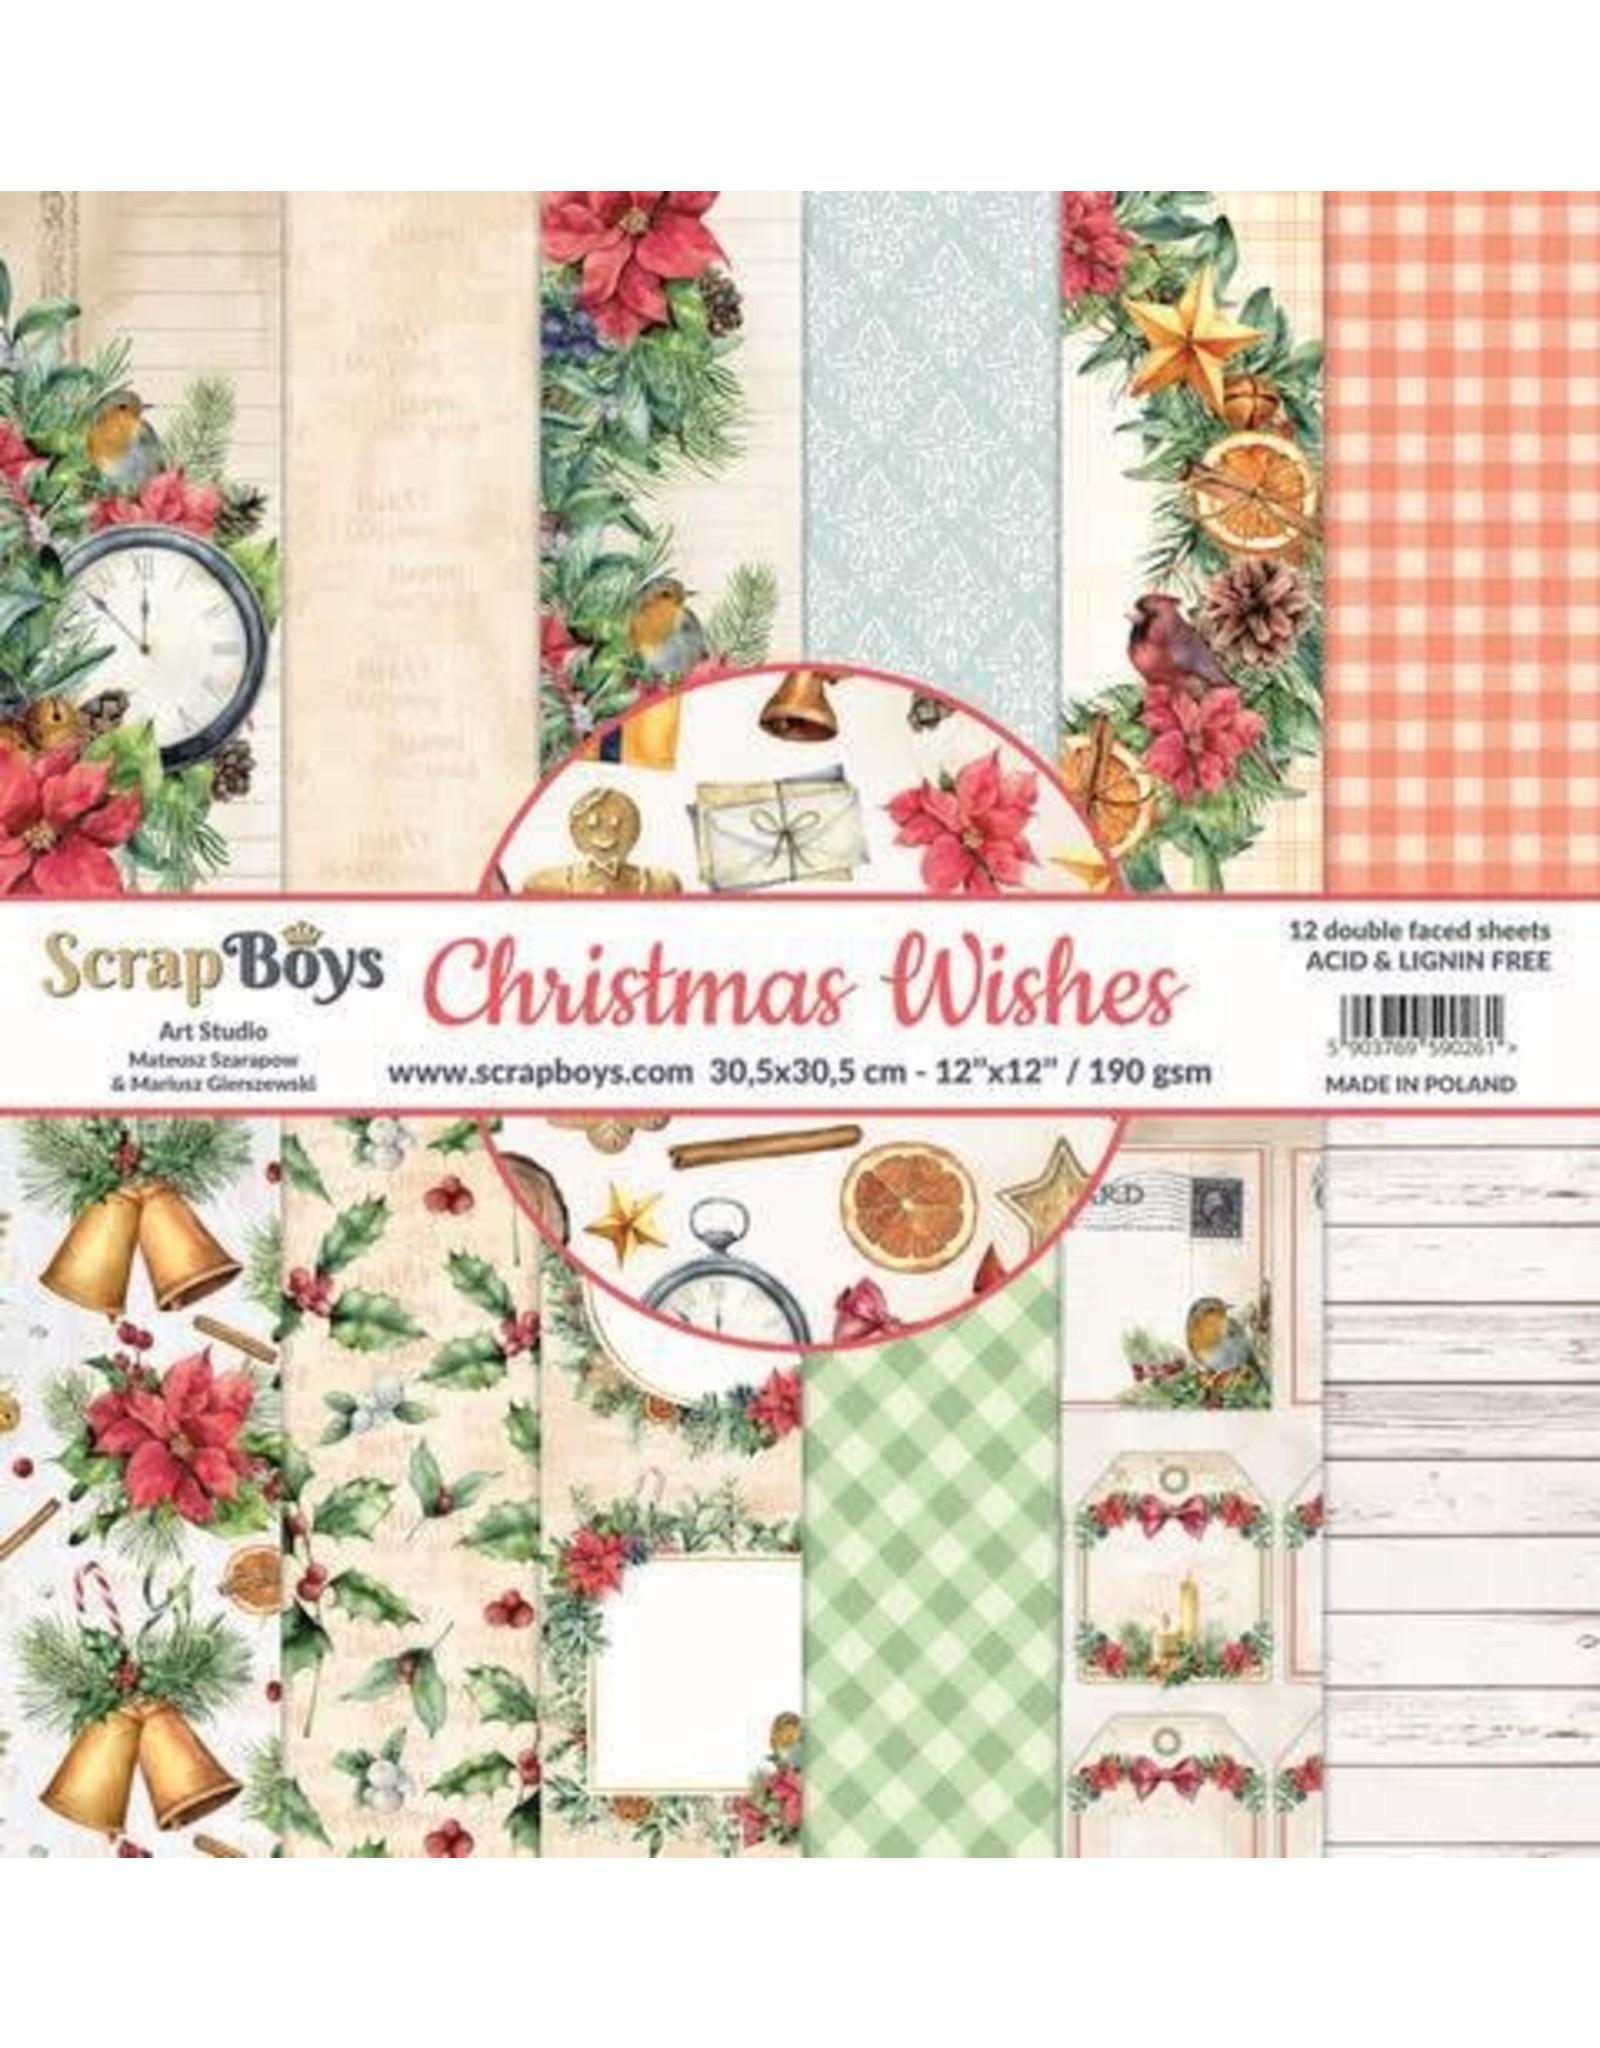 Scrapboys ScrapBoys Christmas Wishes paperset 12 vl+cut out elements-DZ CHWI-08 190gr 30,5 x 30,5cm